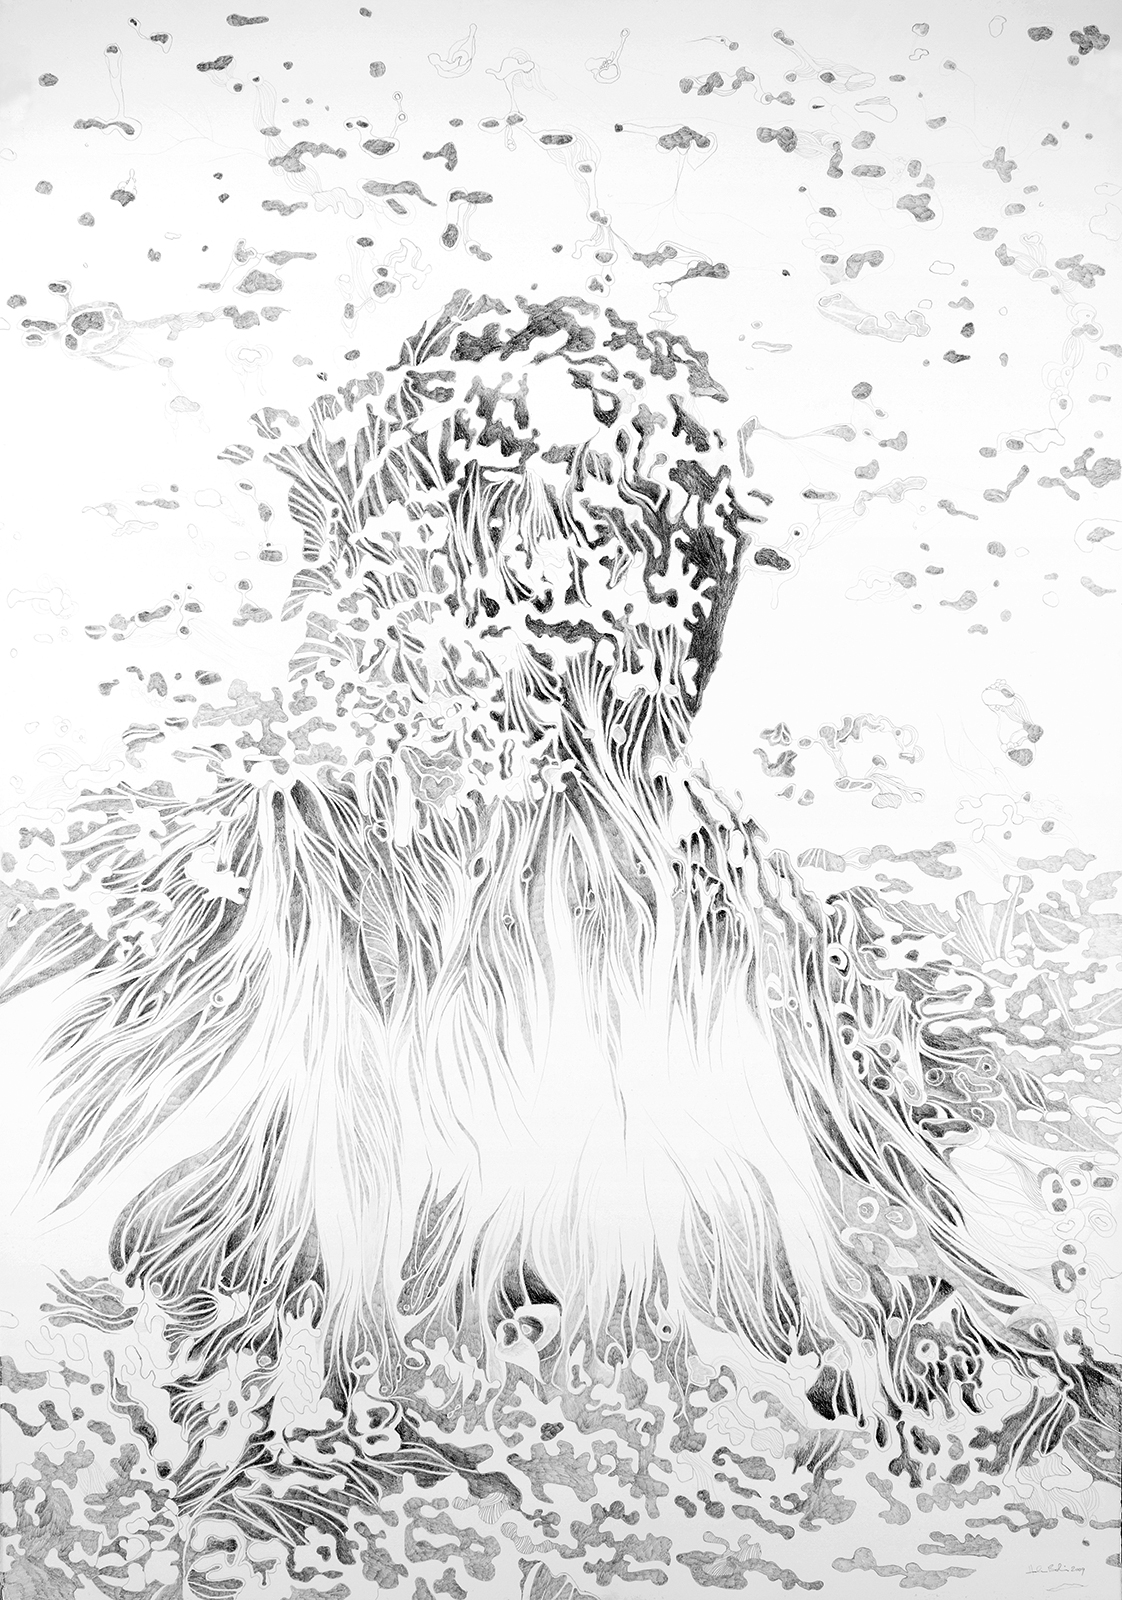 Halvor_Bodin_Nerthus_Eowland_Hydrophobia_series_1600h_o.jpg